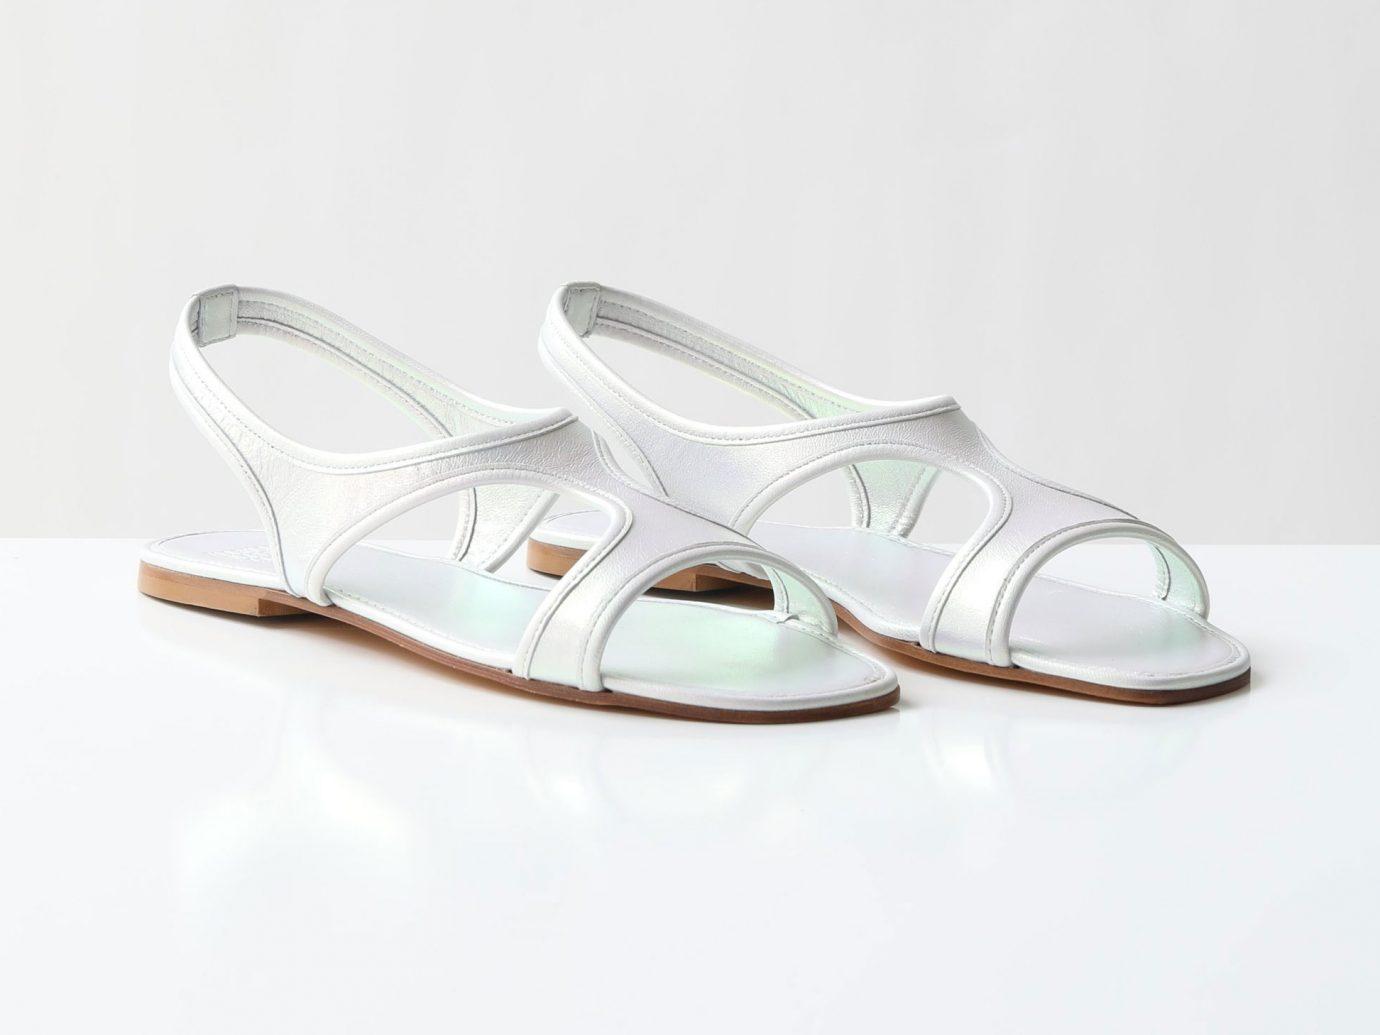 Maryam Nassir Zadeh sale mnz silver corazon flat sandals